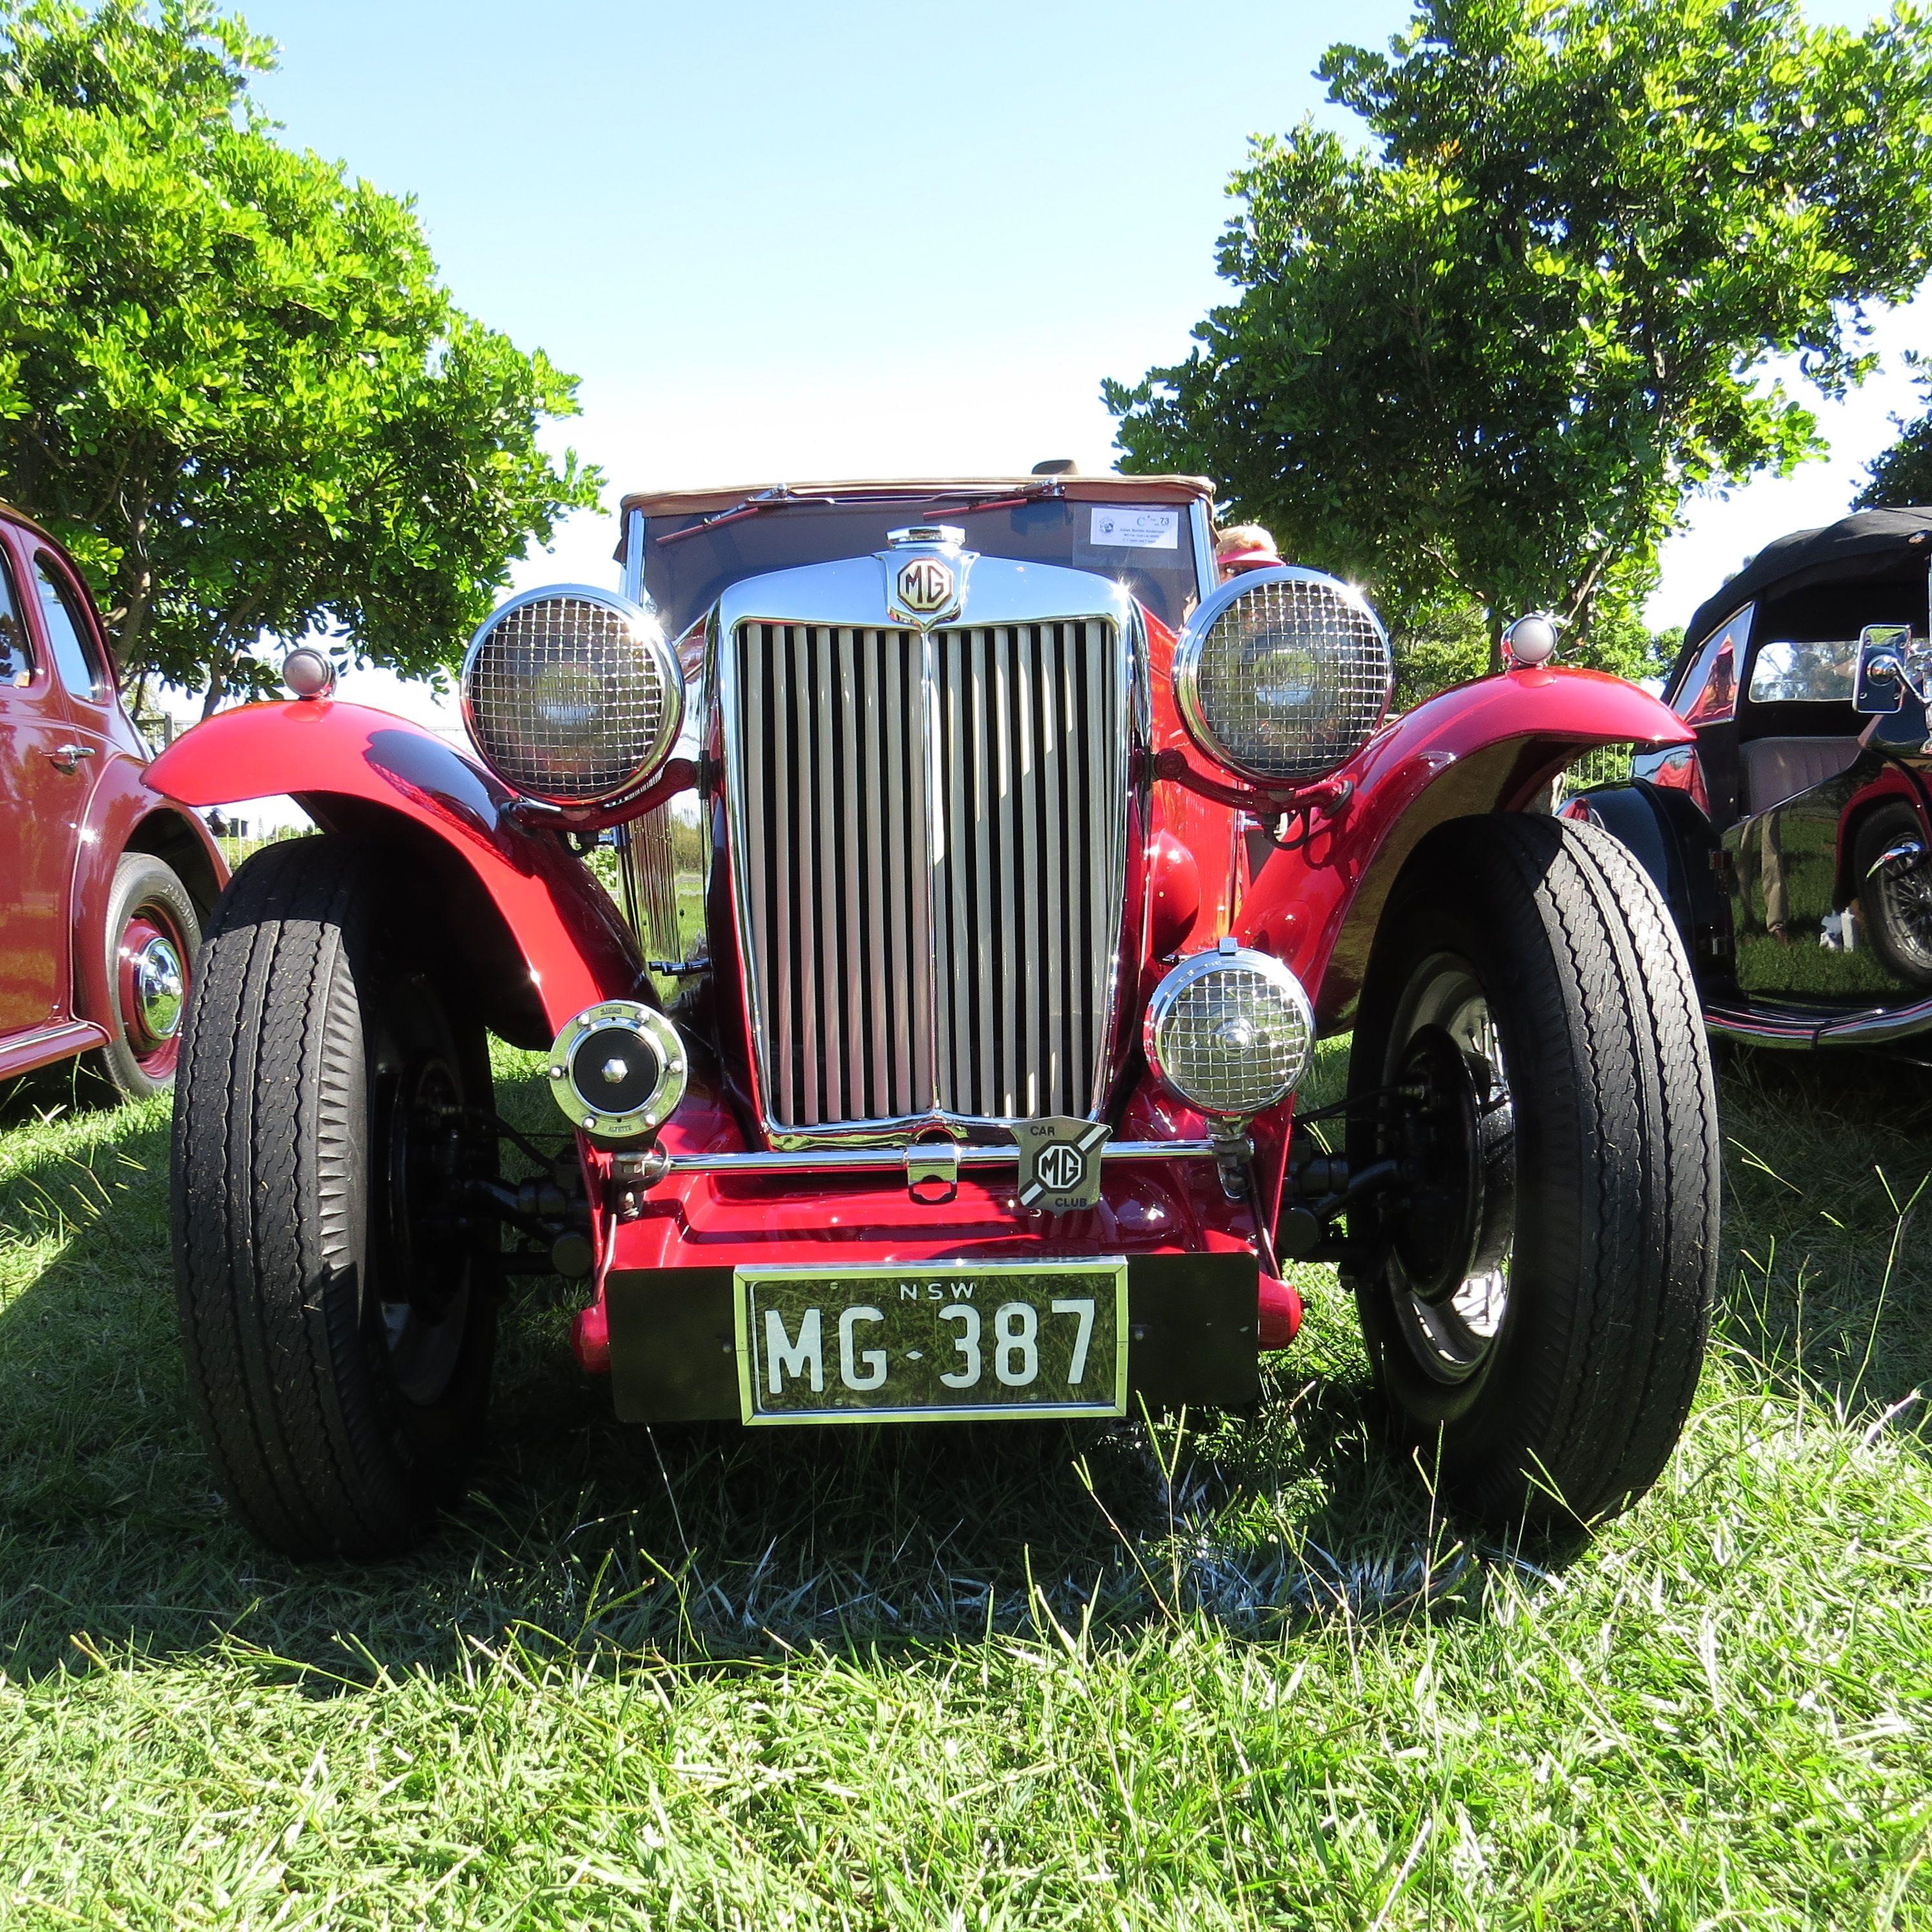 Pin by Jack Arrington on Used Cars | Pinterest | Cars